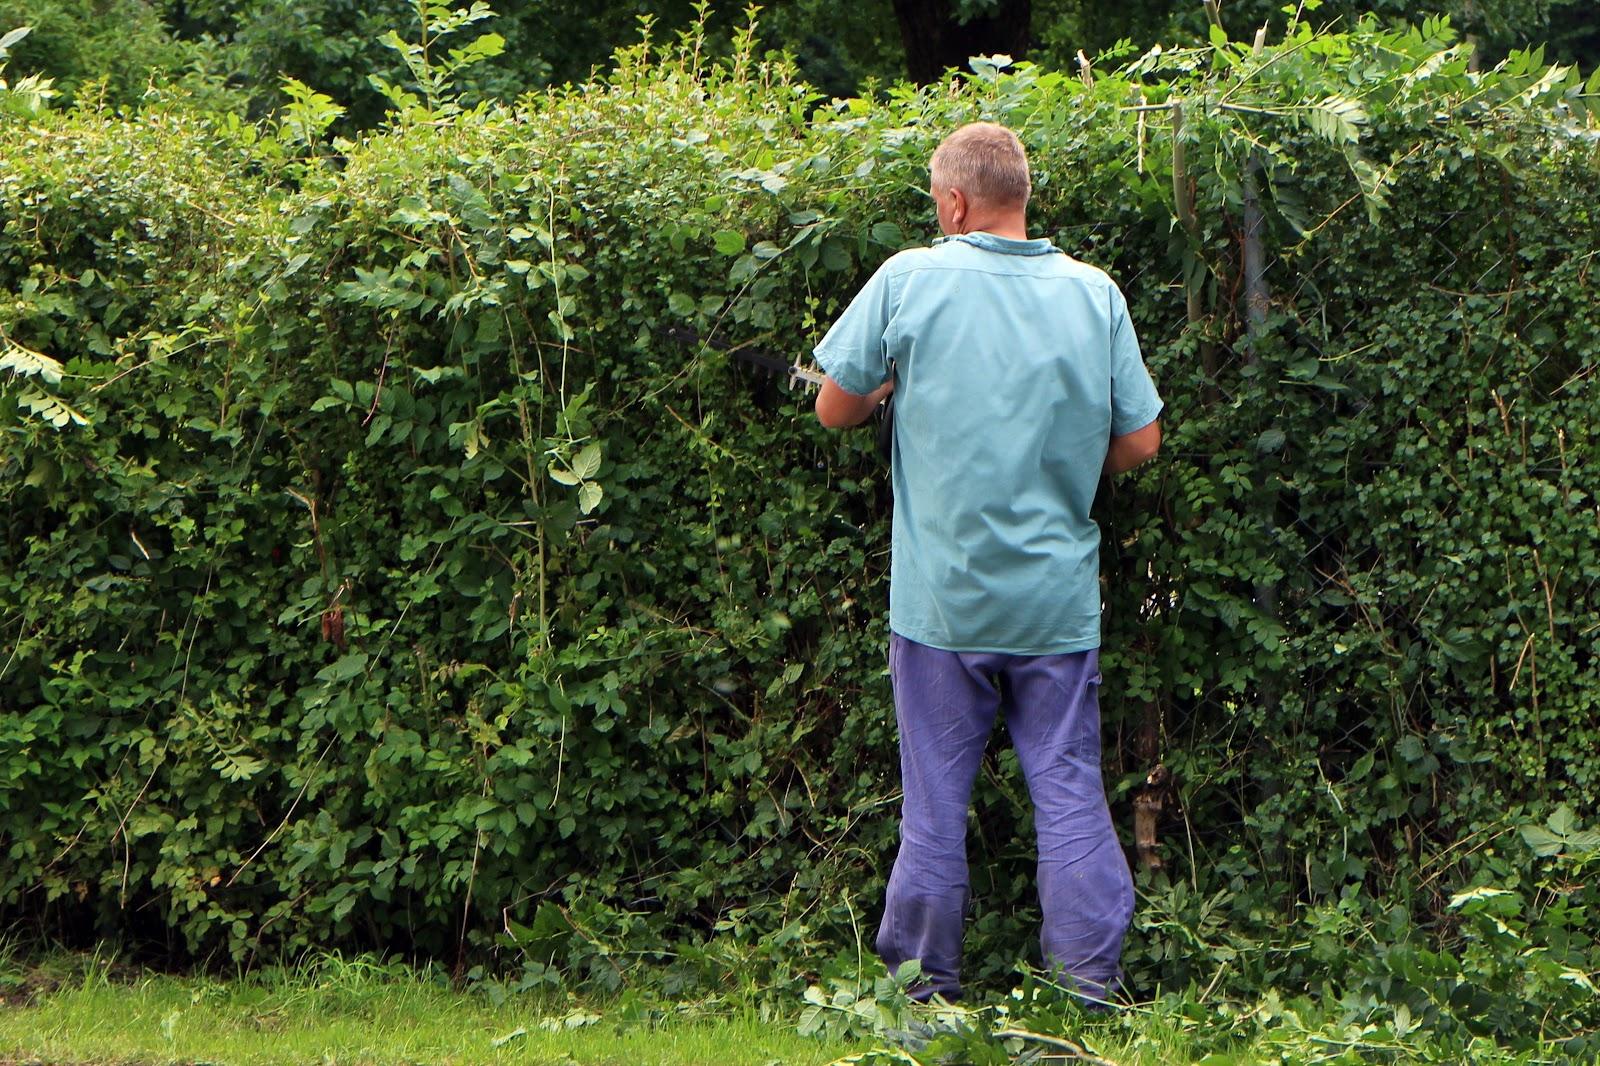 man-tree-grass-person-plant-lawn-meadow-flower-green-agriculture-garden-cut-gardening-shrub-plantation-woodland-workers-hedge-gardener-pruning-individually-landscape-gardener-woody-plant-948633.jpg